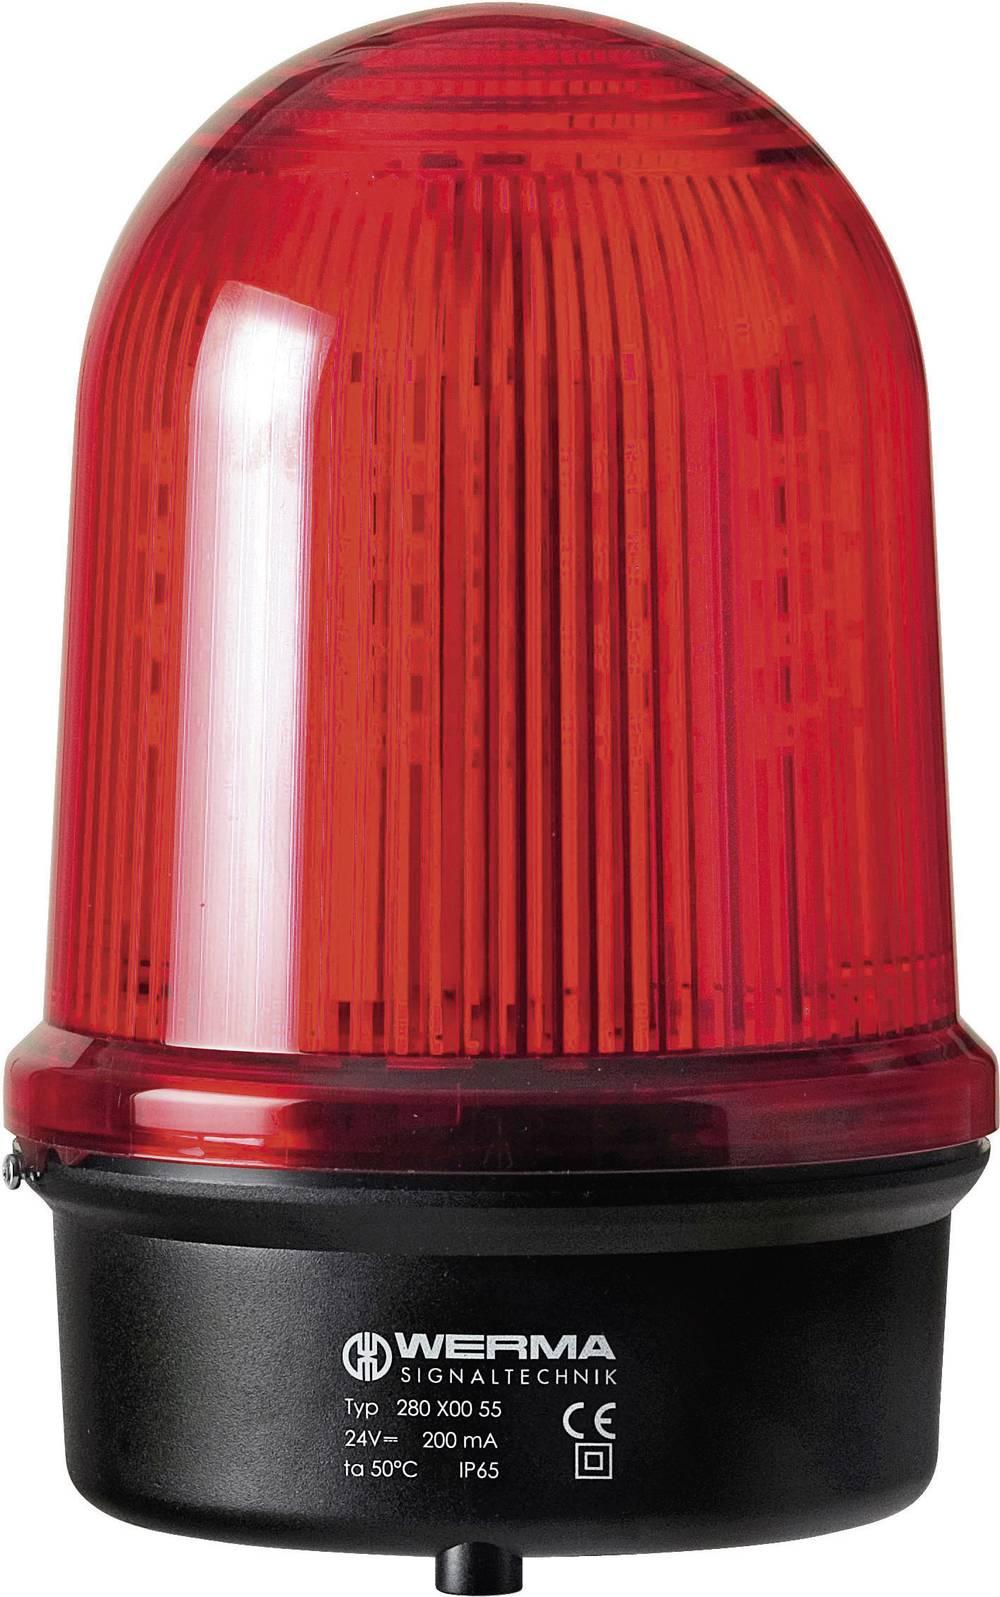 Werma Signaltechnik 280.120.68 LED-luč vrtljiva 115 - 230 V/AC, rdeča